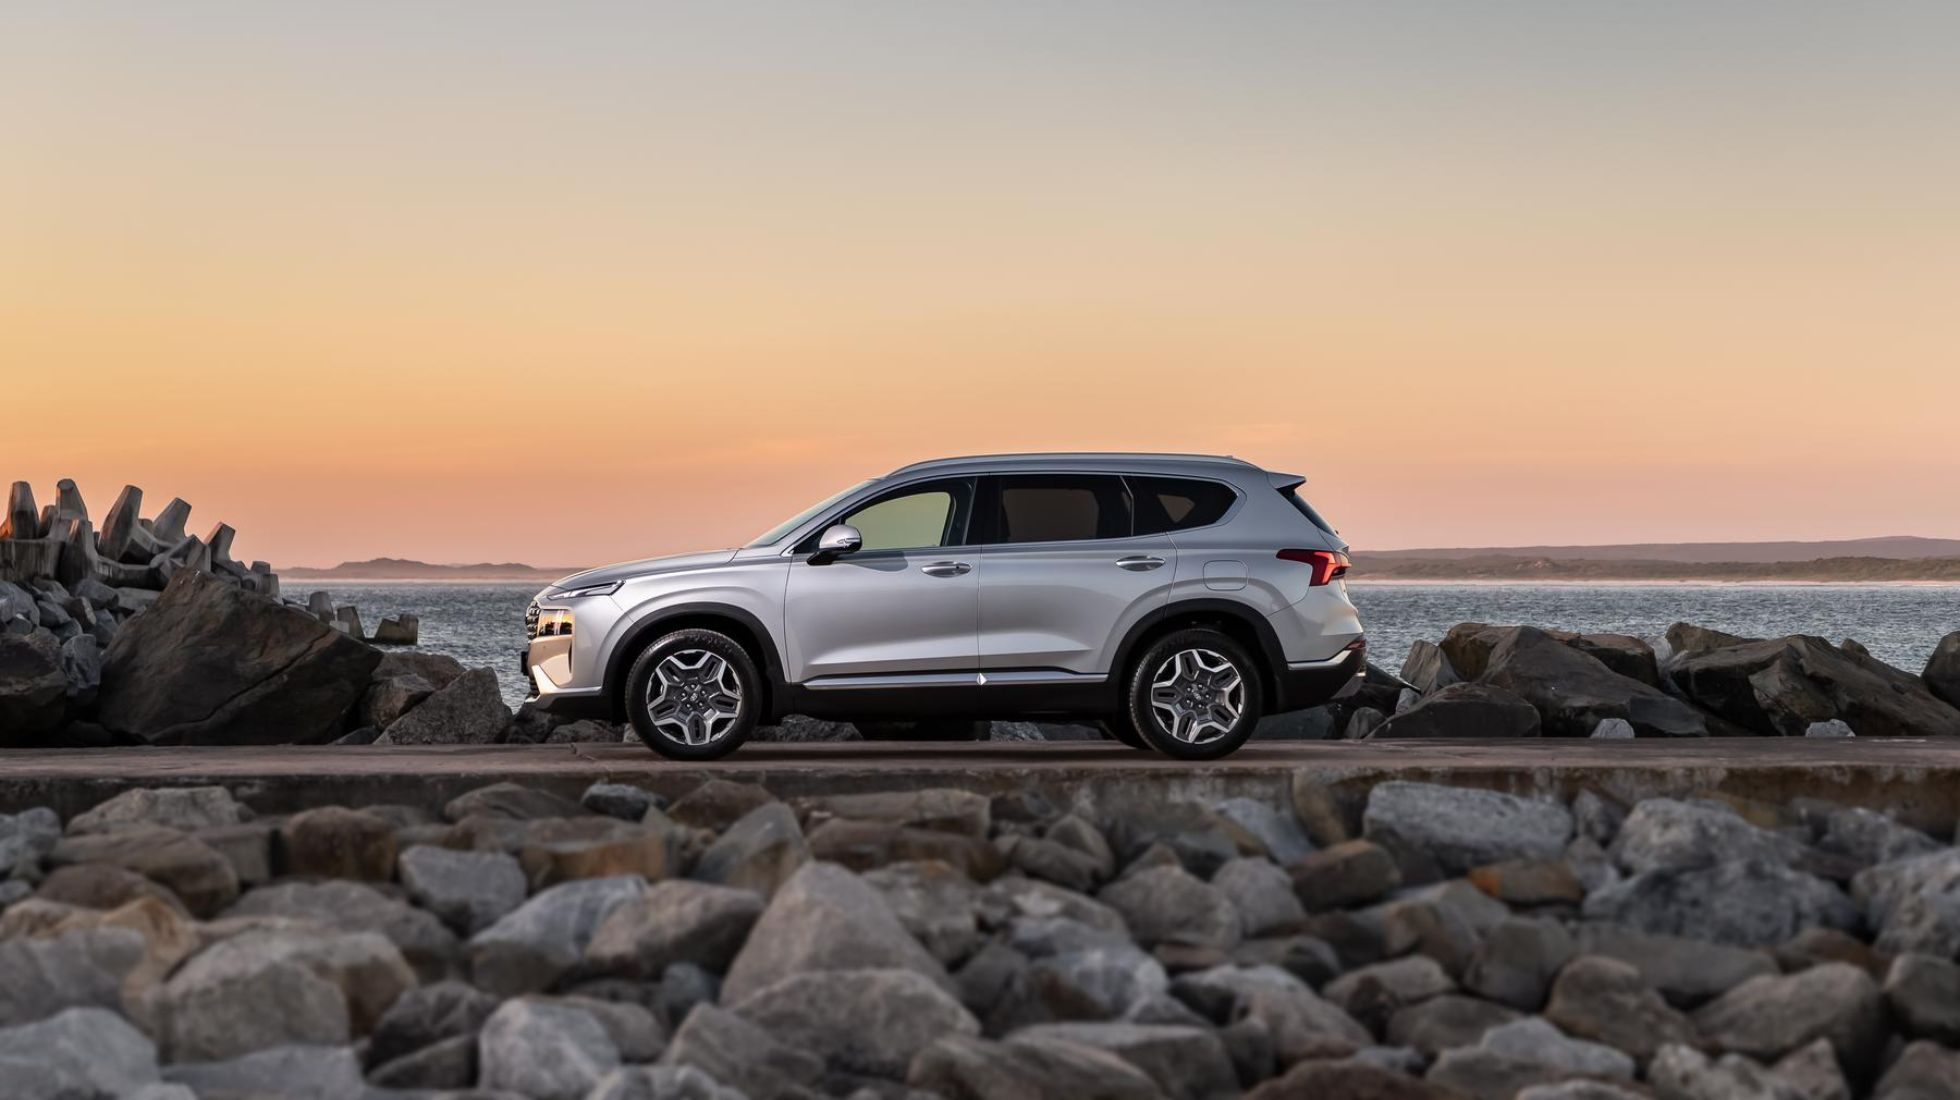 Hyundai Santa Fe gets bold mid-life enhancements